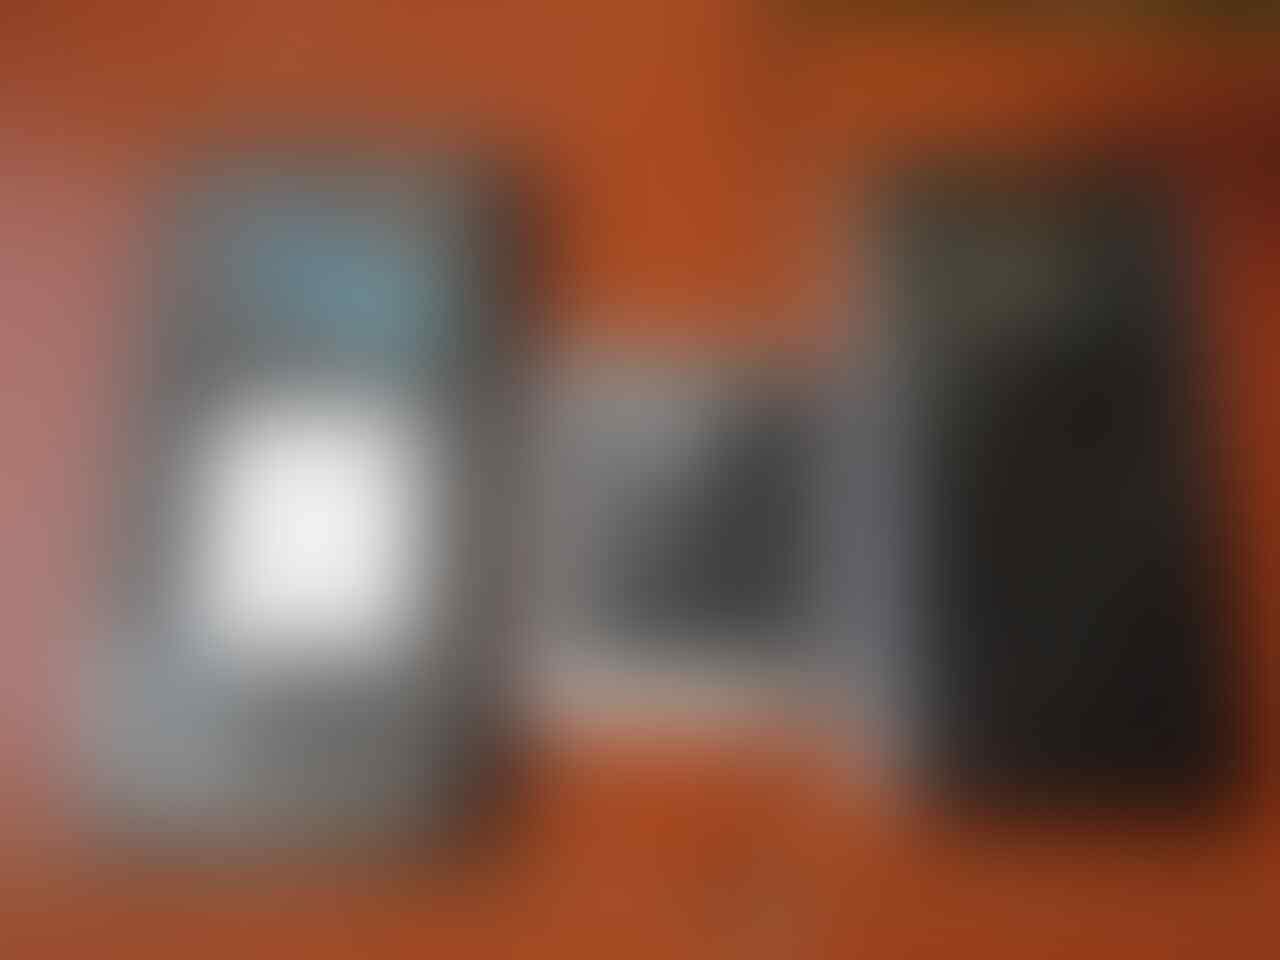 Samsung Galaxy Note 2 | Note II | Titanium Grey | Fitur S5 dan Note 3 | BOGOR